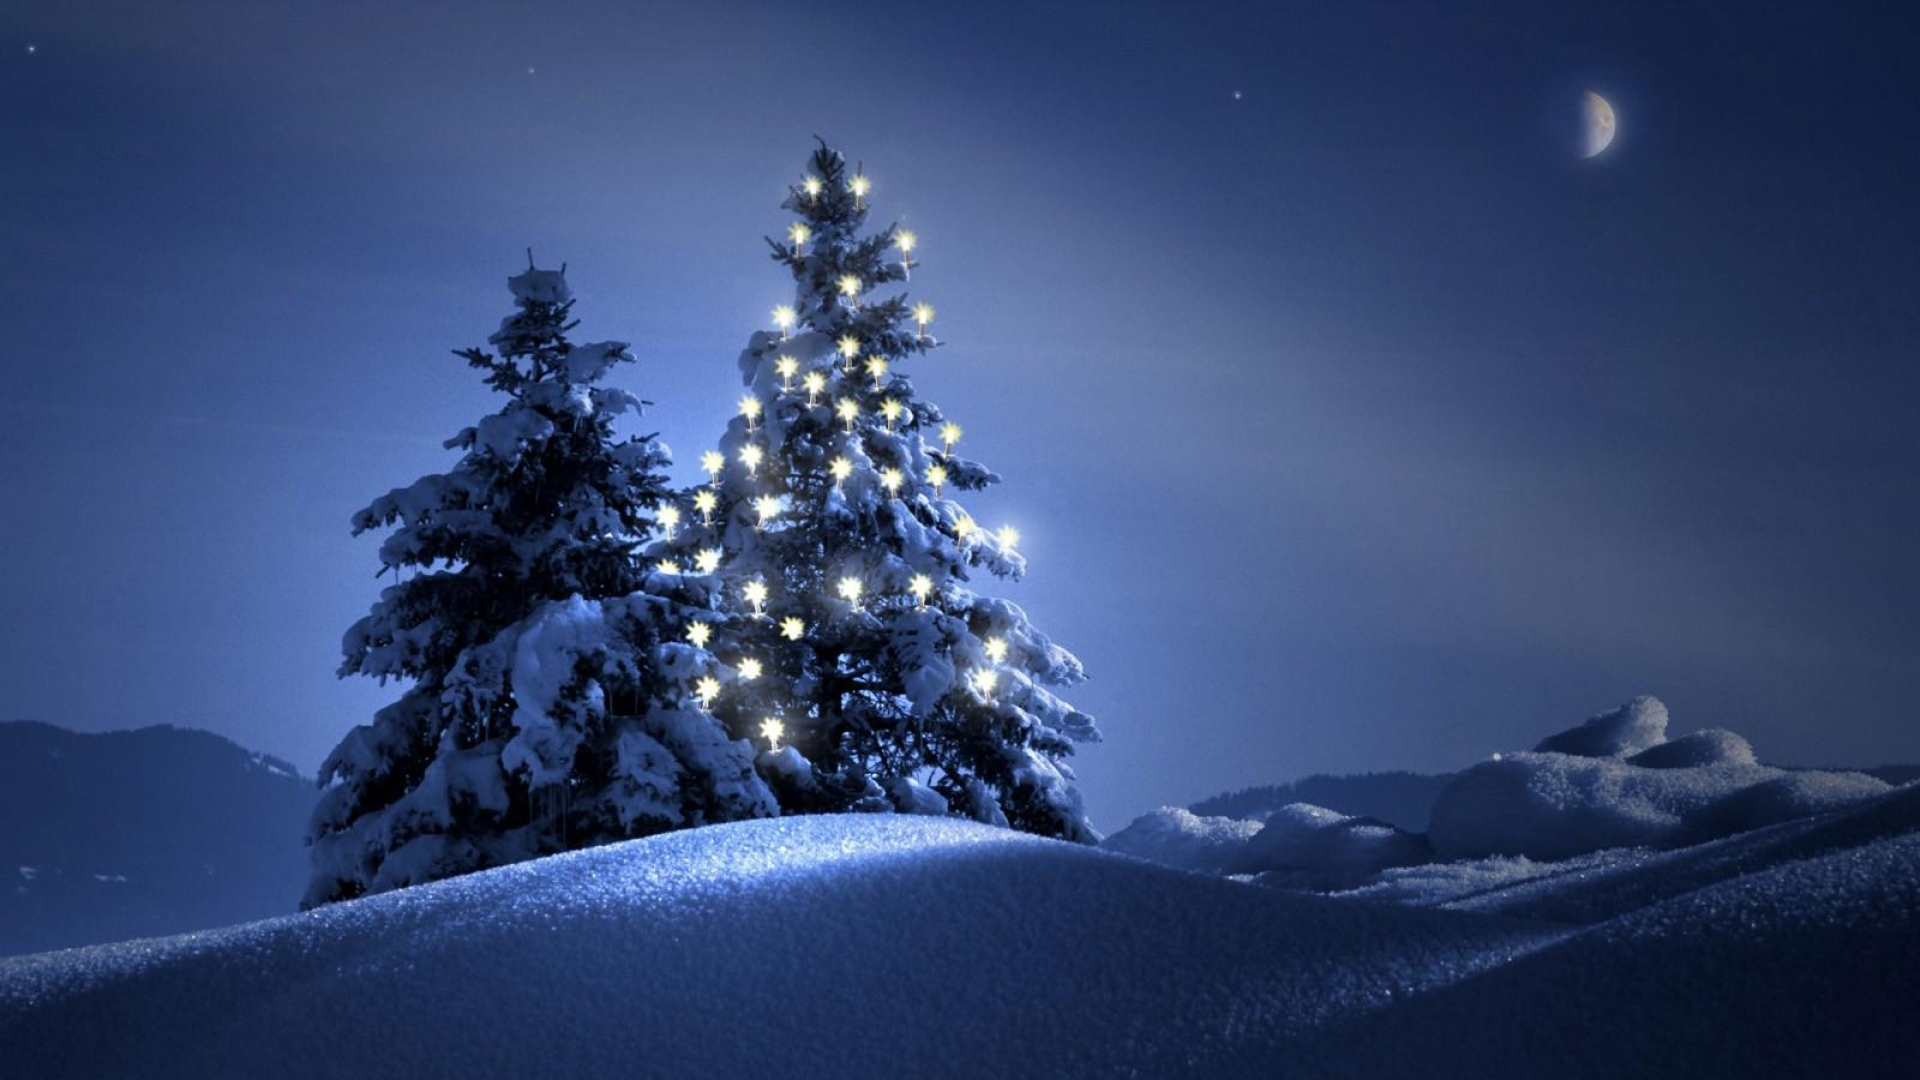 Download Wallpaper 1920x1080 trees, steam, garland, snow, night ...